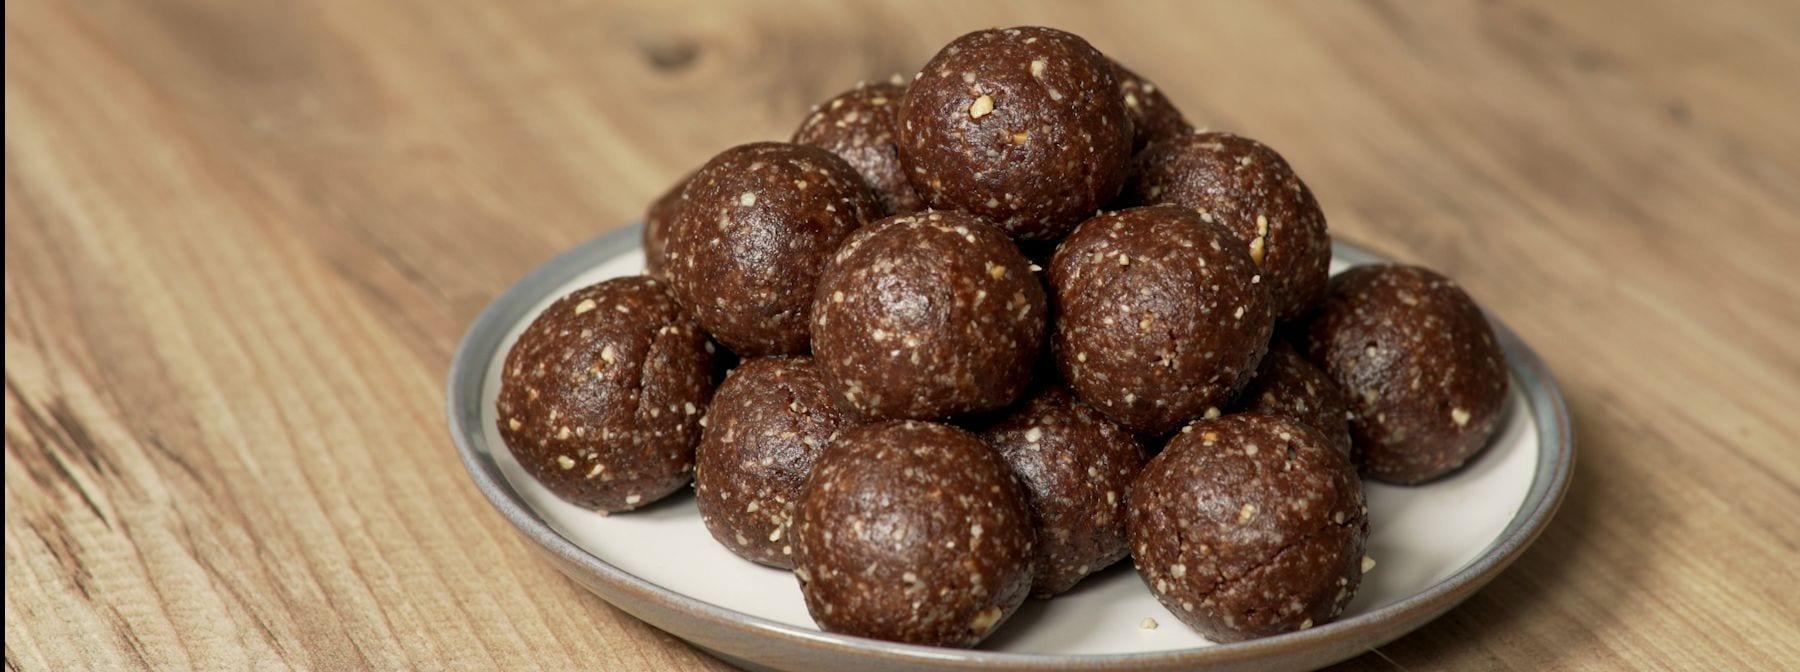 Brownies kuličky ze tří ingrediencí